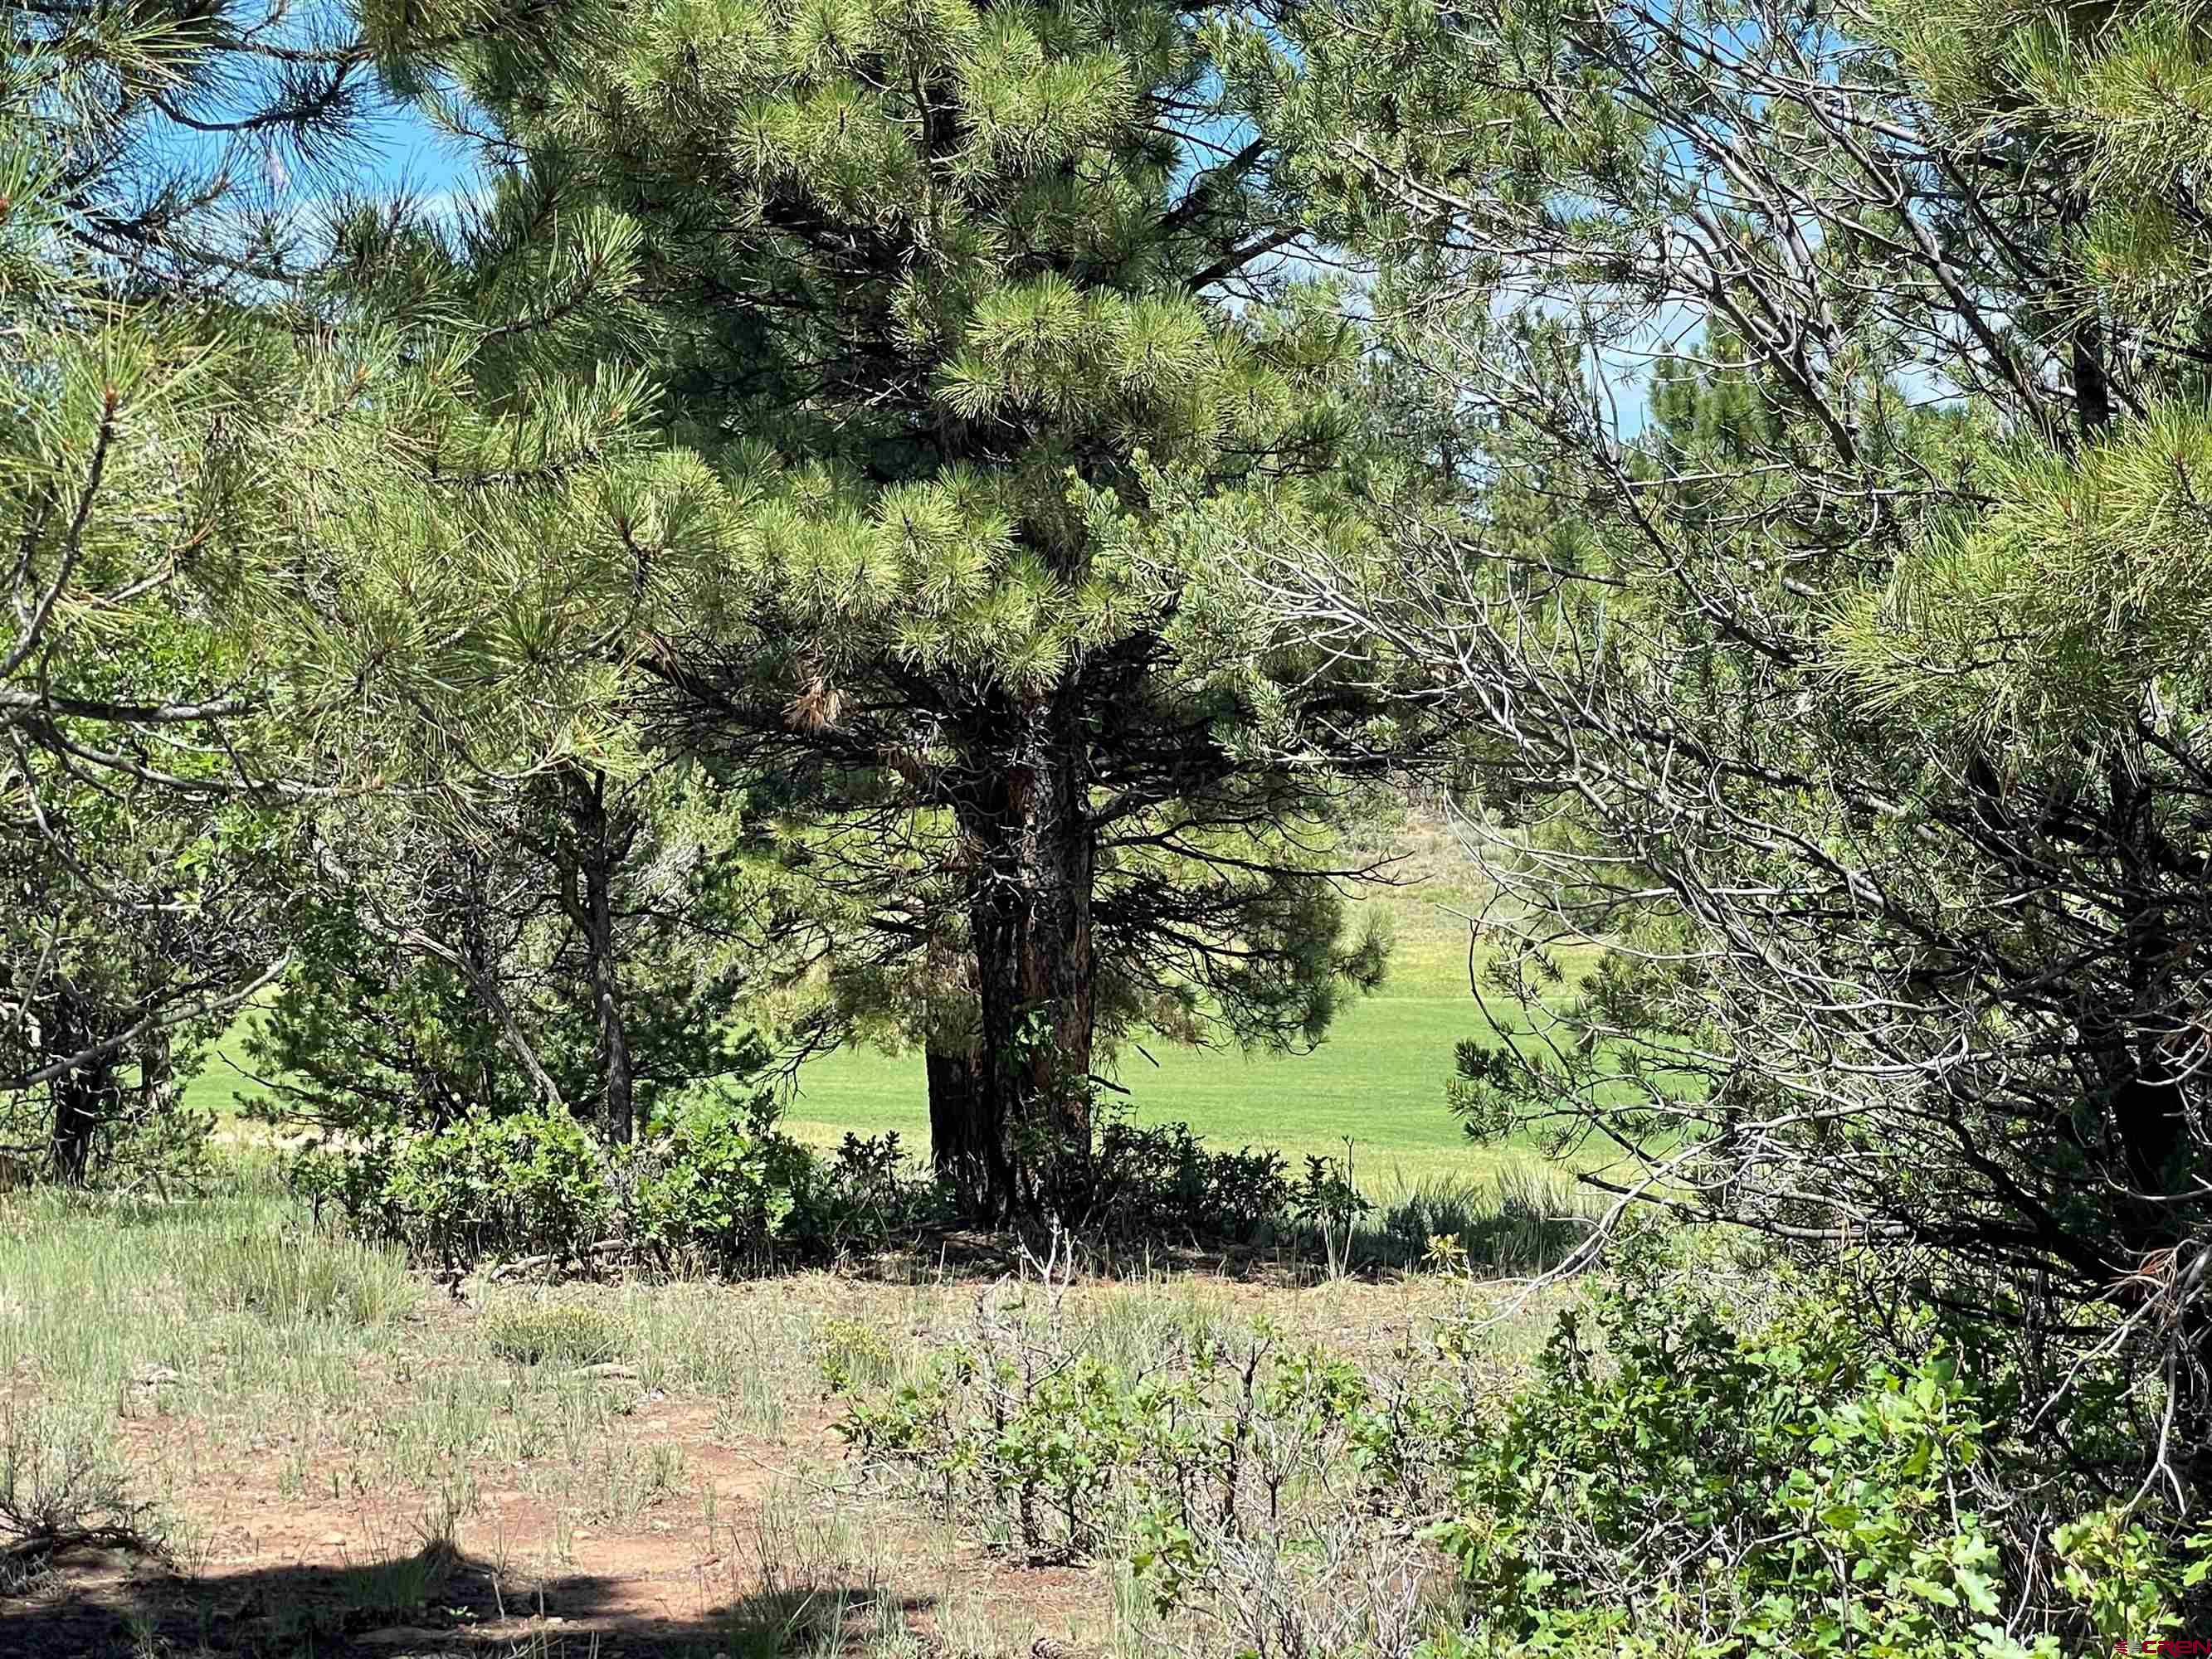 Tbd (lot 540) N Badger Trail Property Photo